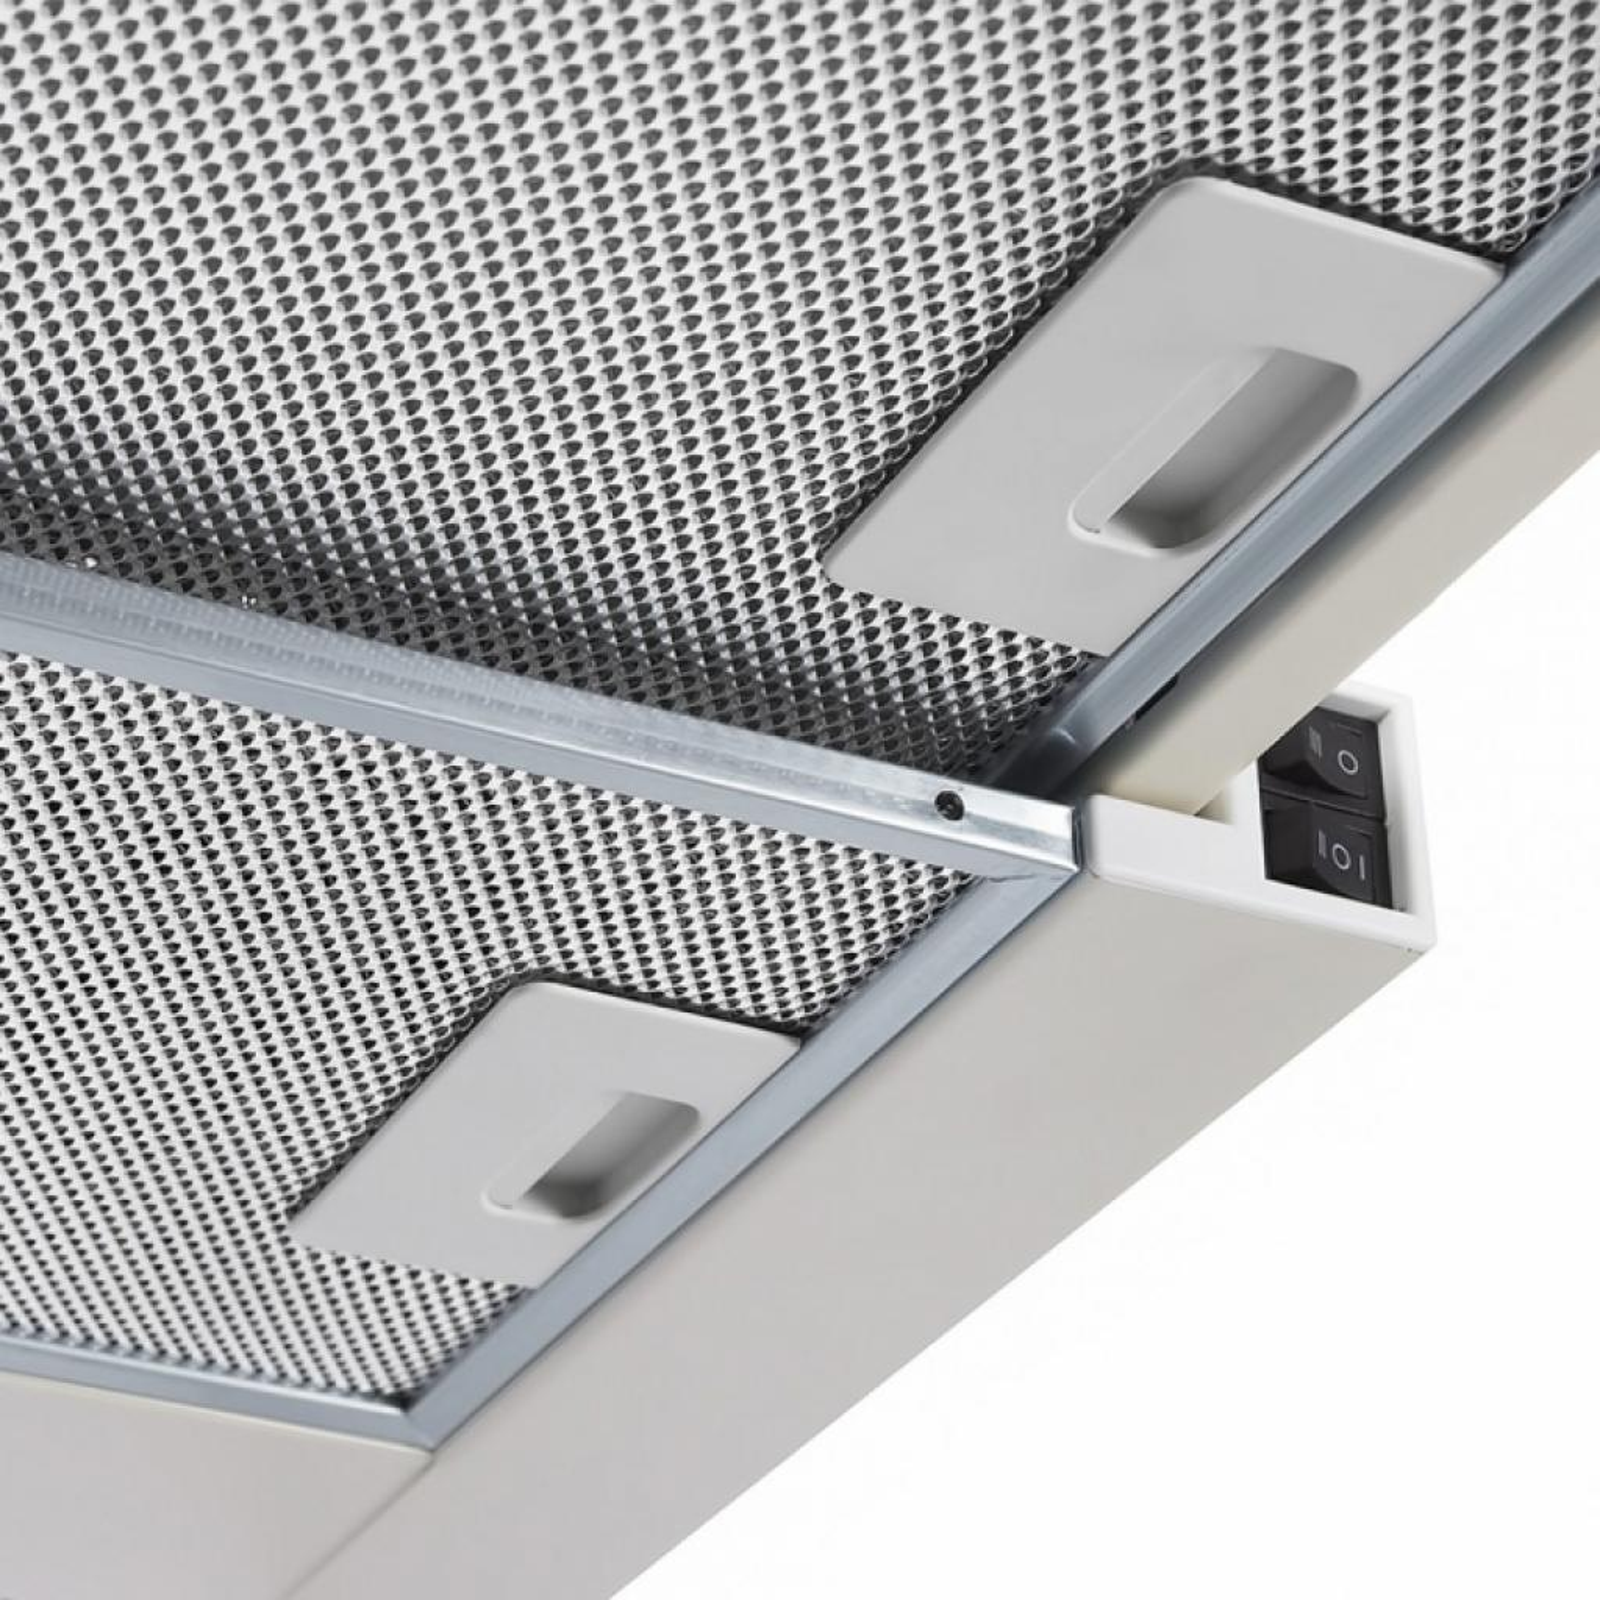 Вытяжка кухонная PERFELLI TL 6612 BL LED изображение 4